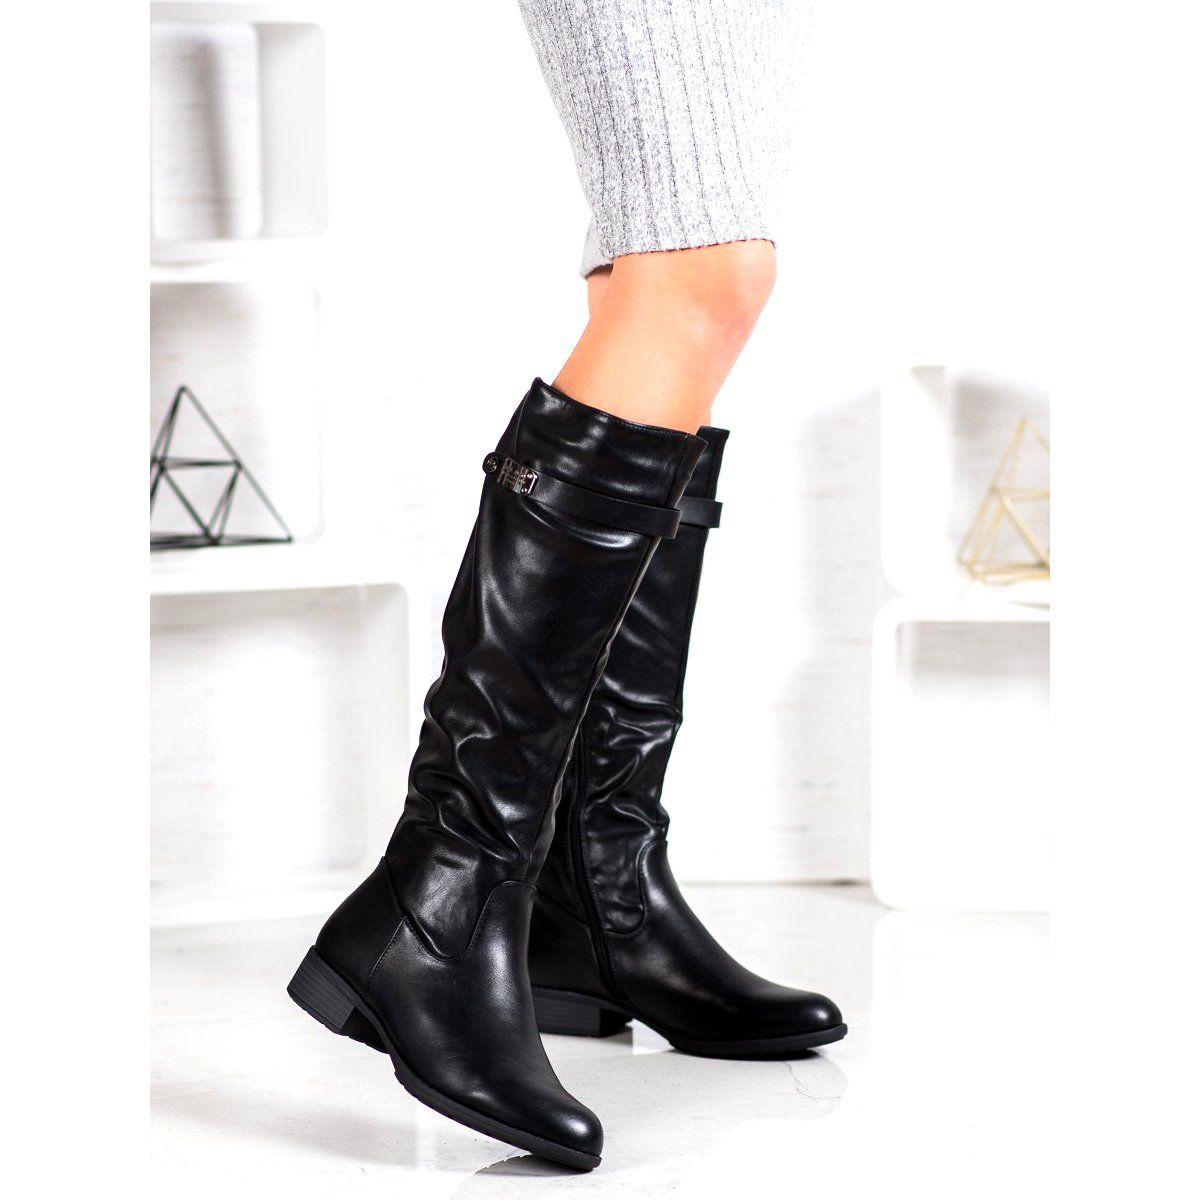 Gogo Czarne Oficerki Z Eko Skory Boots Shoes Riding Boots